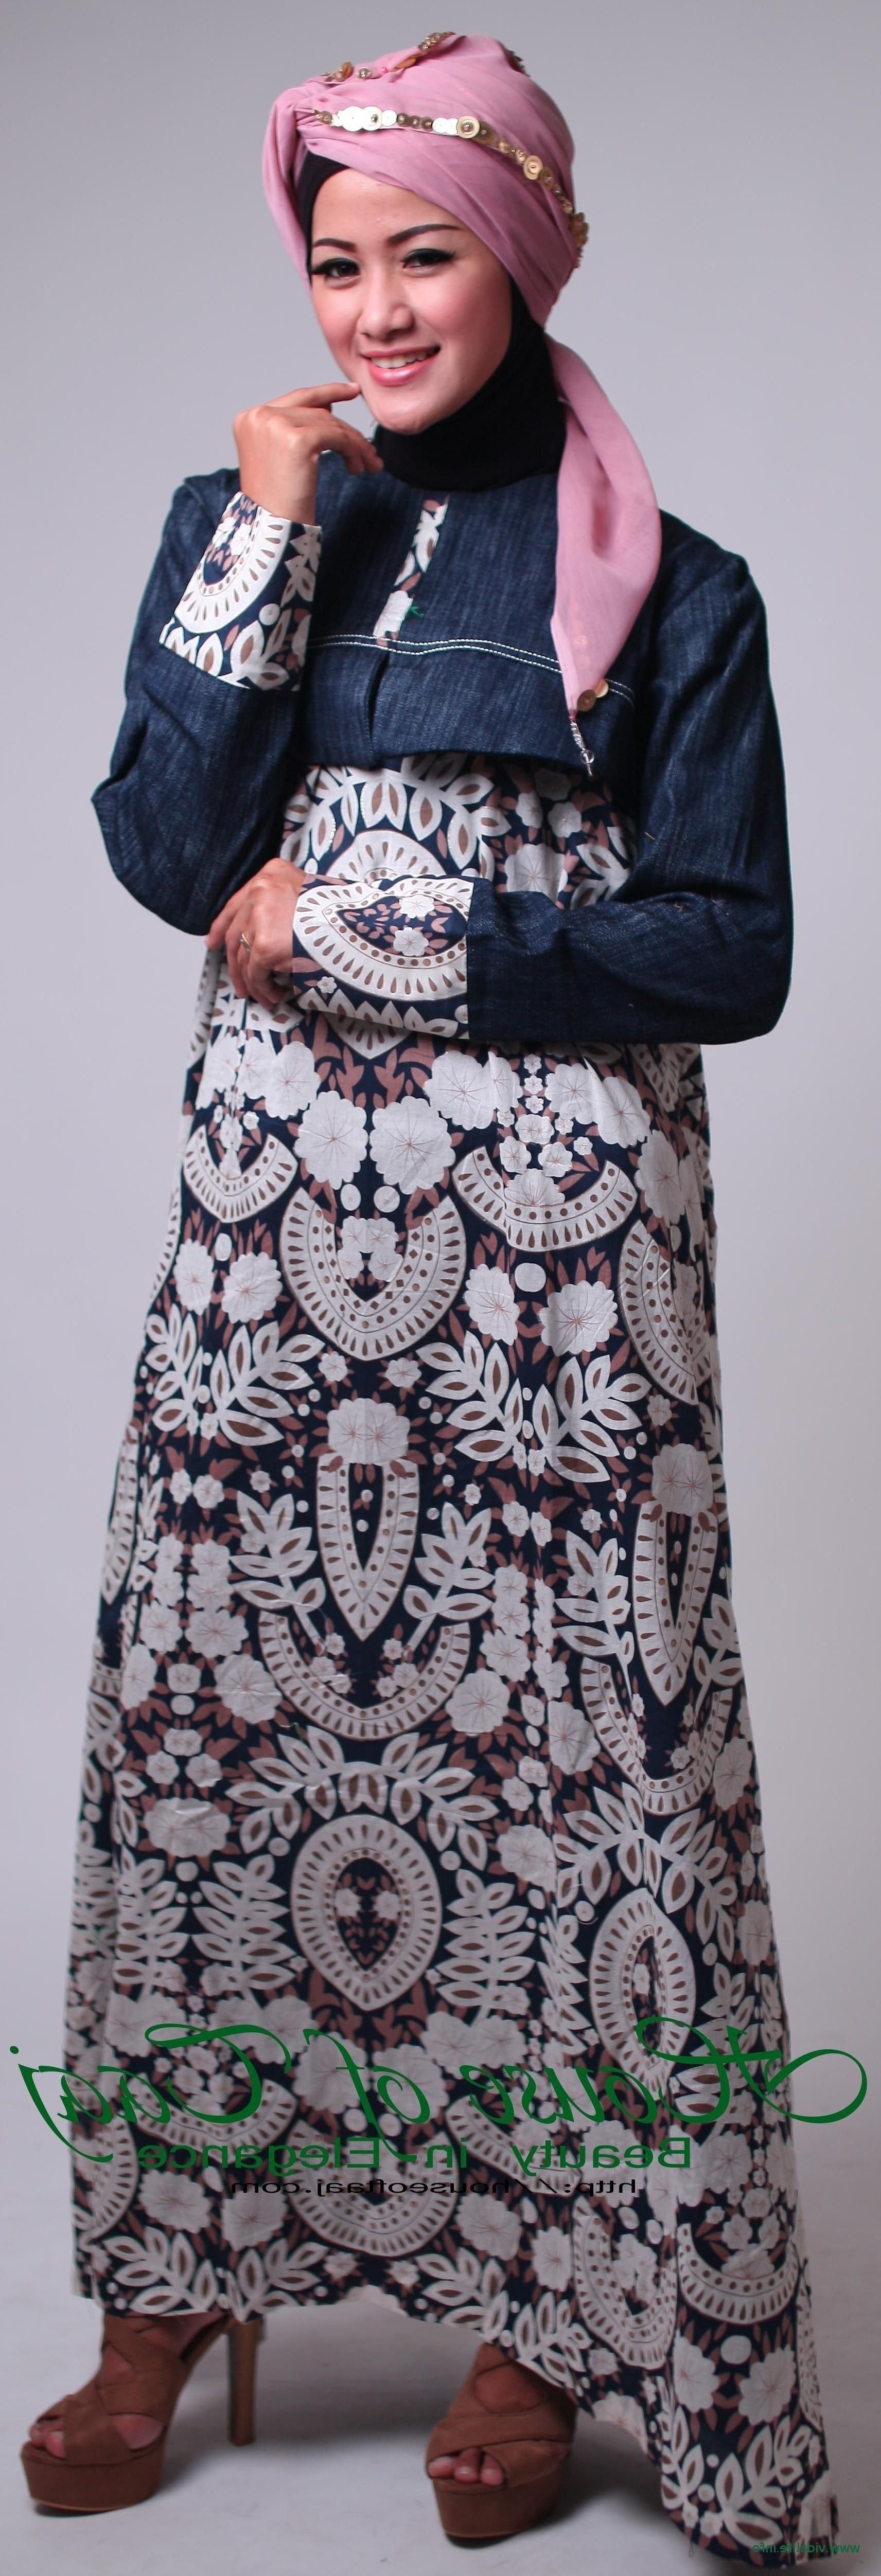 Design Grosir Baju Pengantin Muslim S1du Gaun Pengantin Muslimah Bagus Jual Mainboard W210cumb 0d